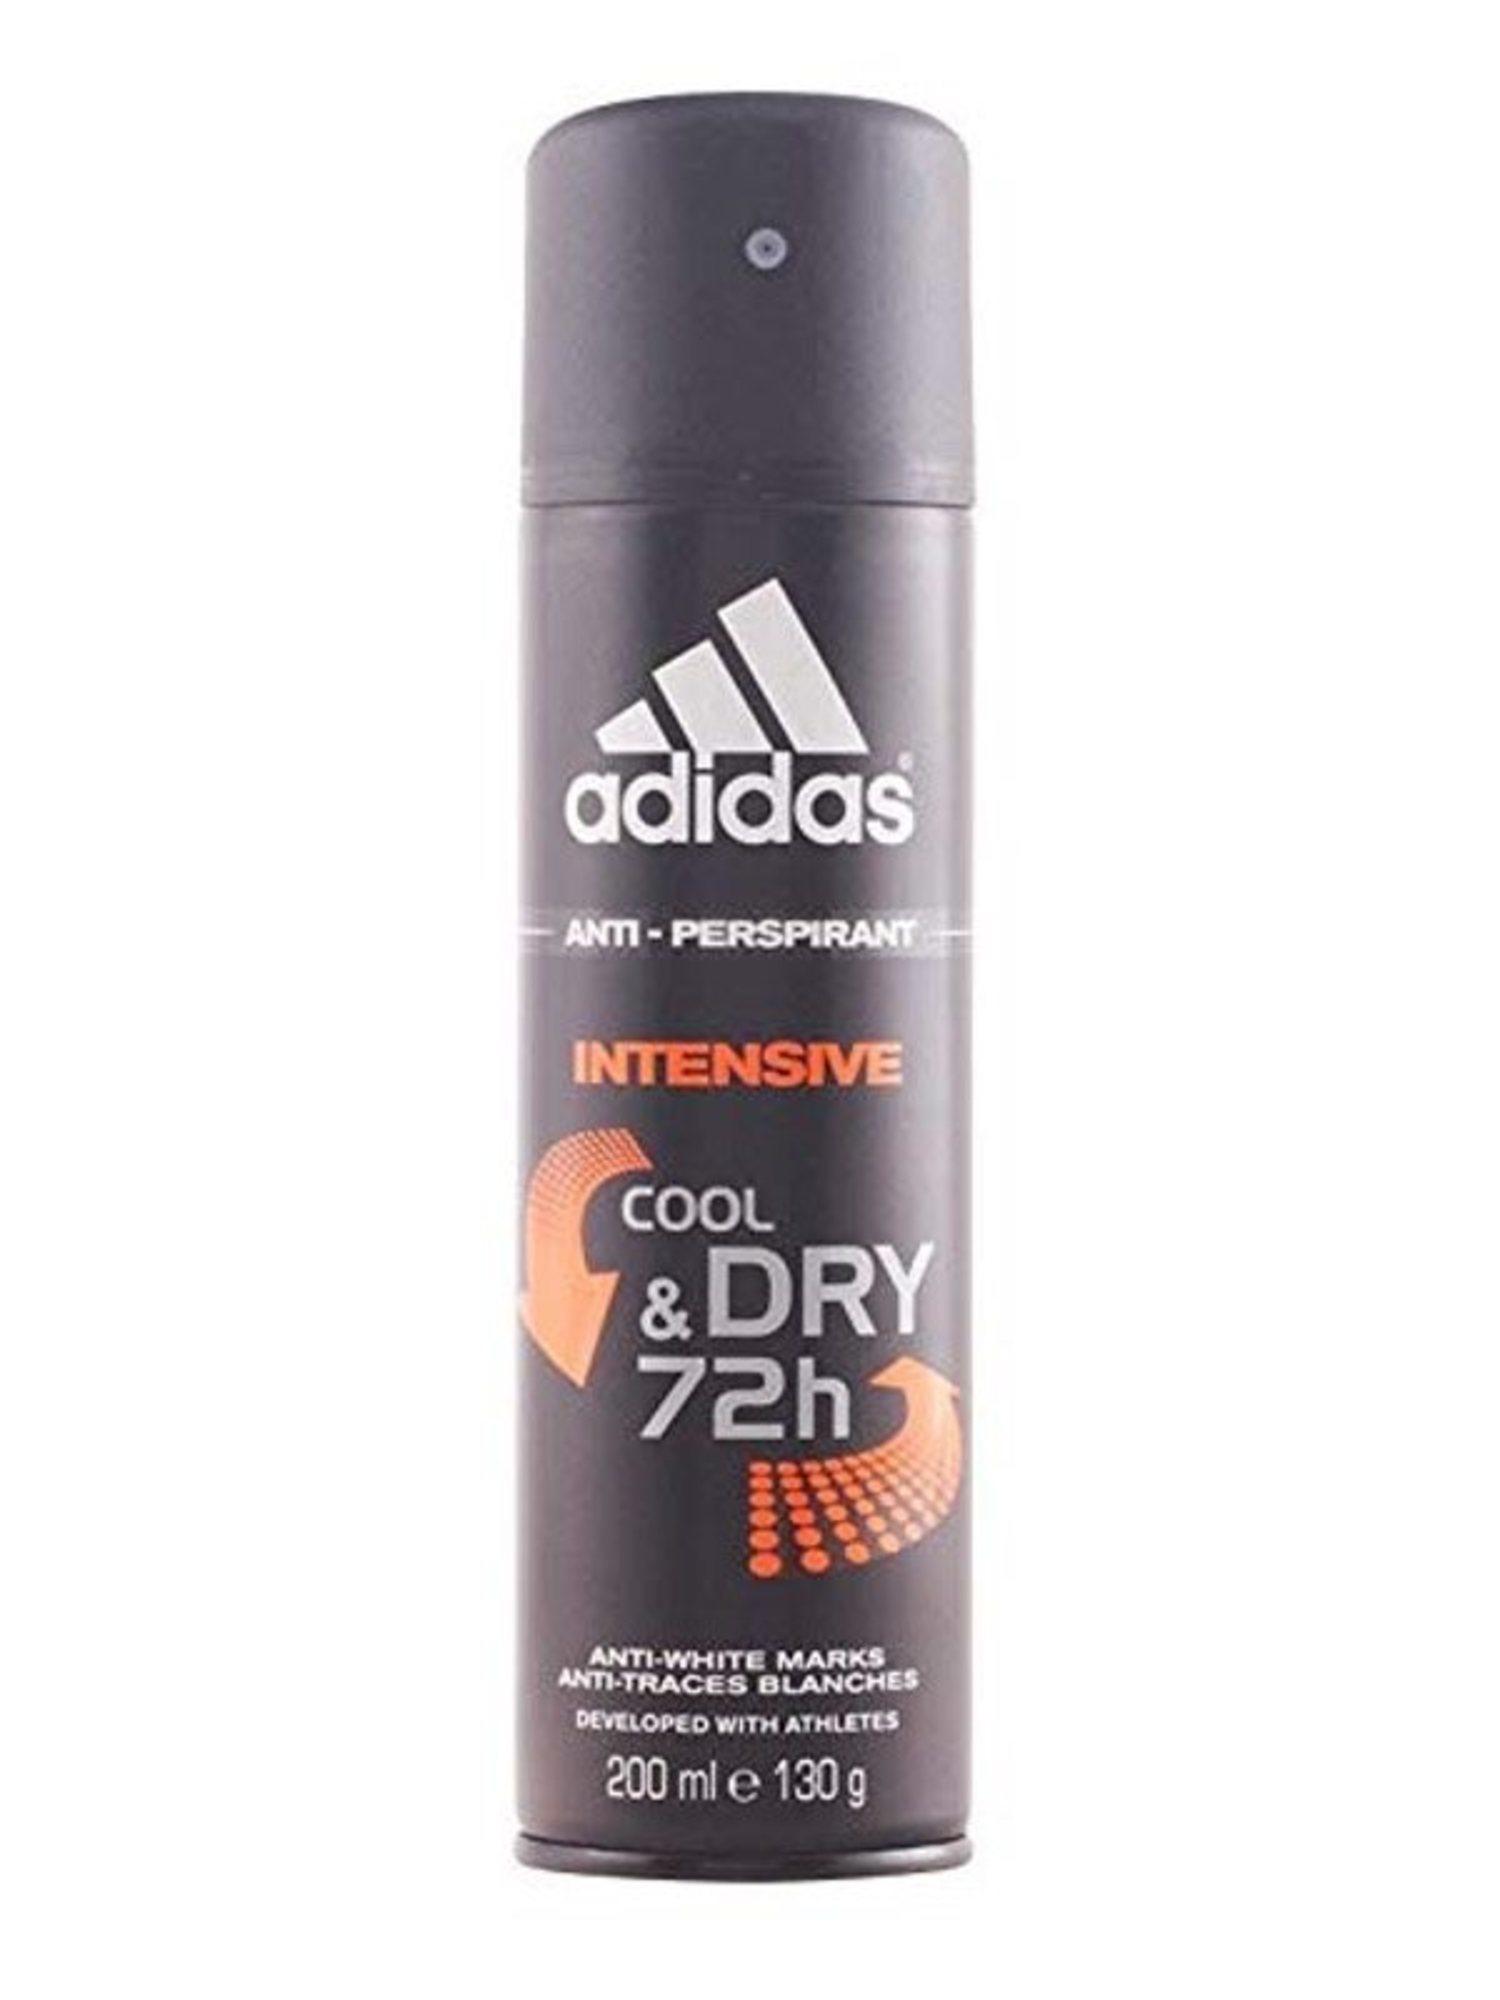 Adidas intensive 200 ml